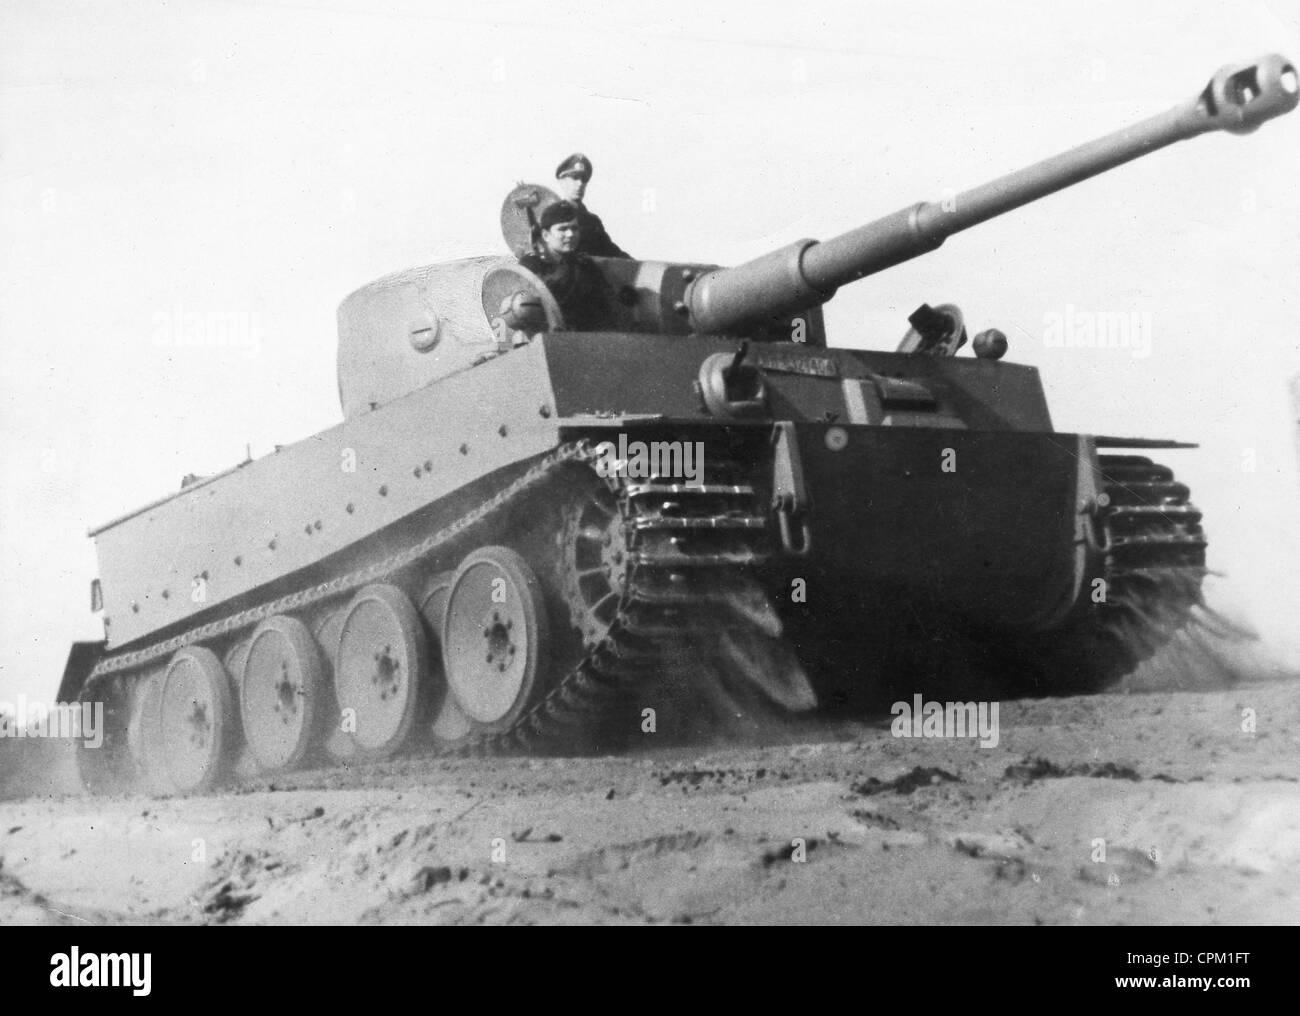 panzer vi tiger stock photos panzer vi tiger stock. Black Bedroom Furniture Sets. Home Design Ideas